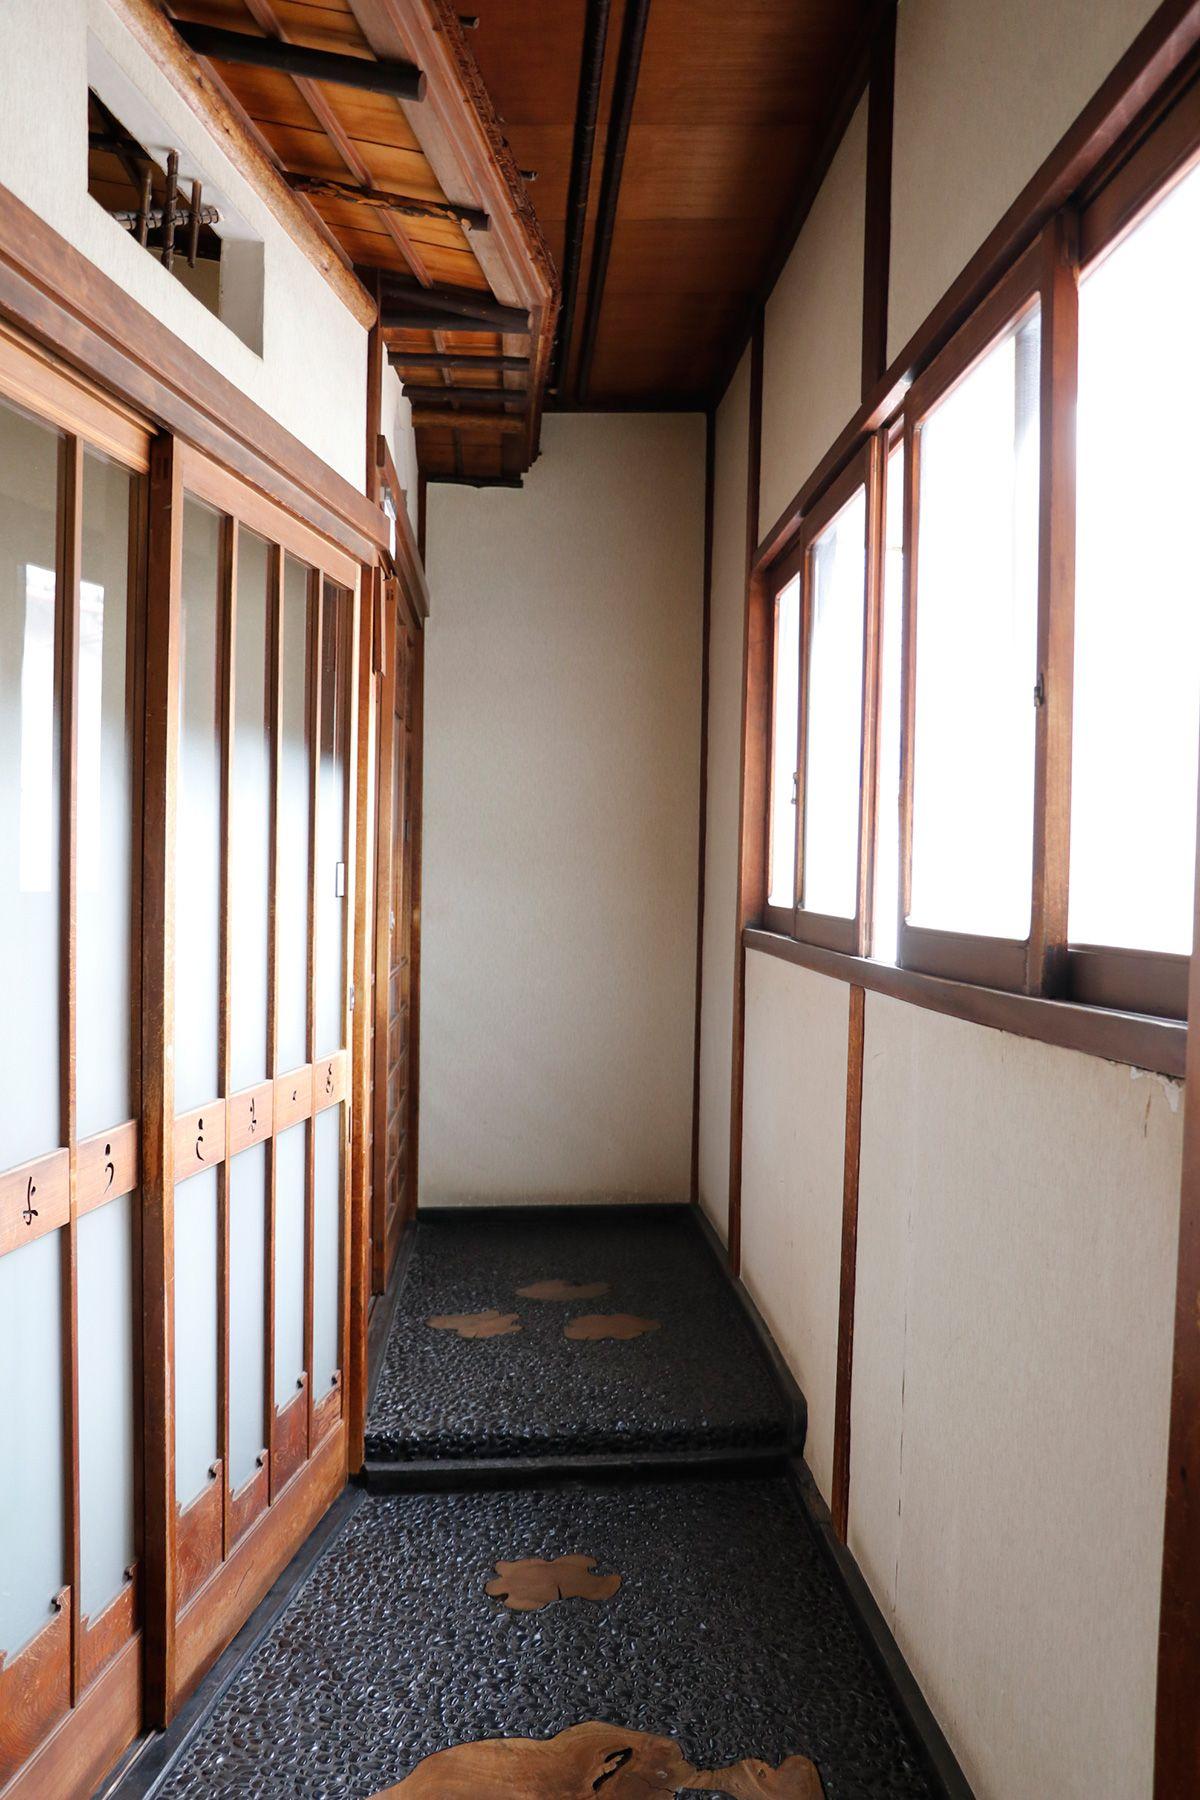 HOMEIKAN 森川別館/旅館 (ホウメイカン)部屋前の廊下